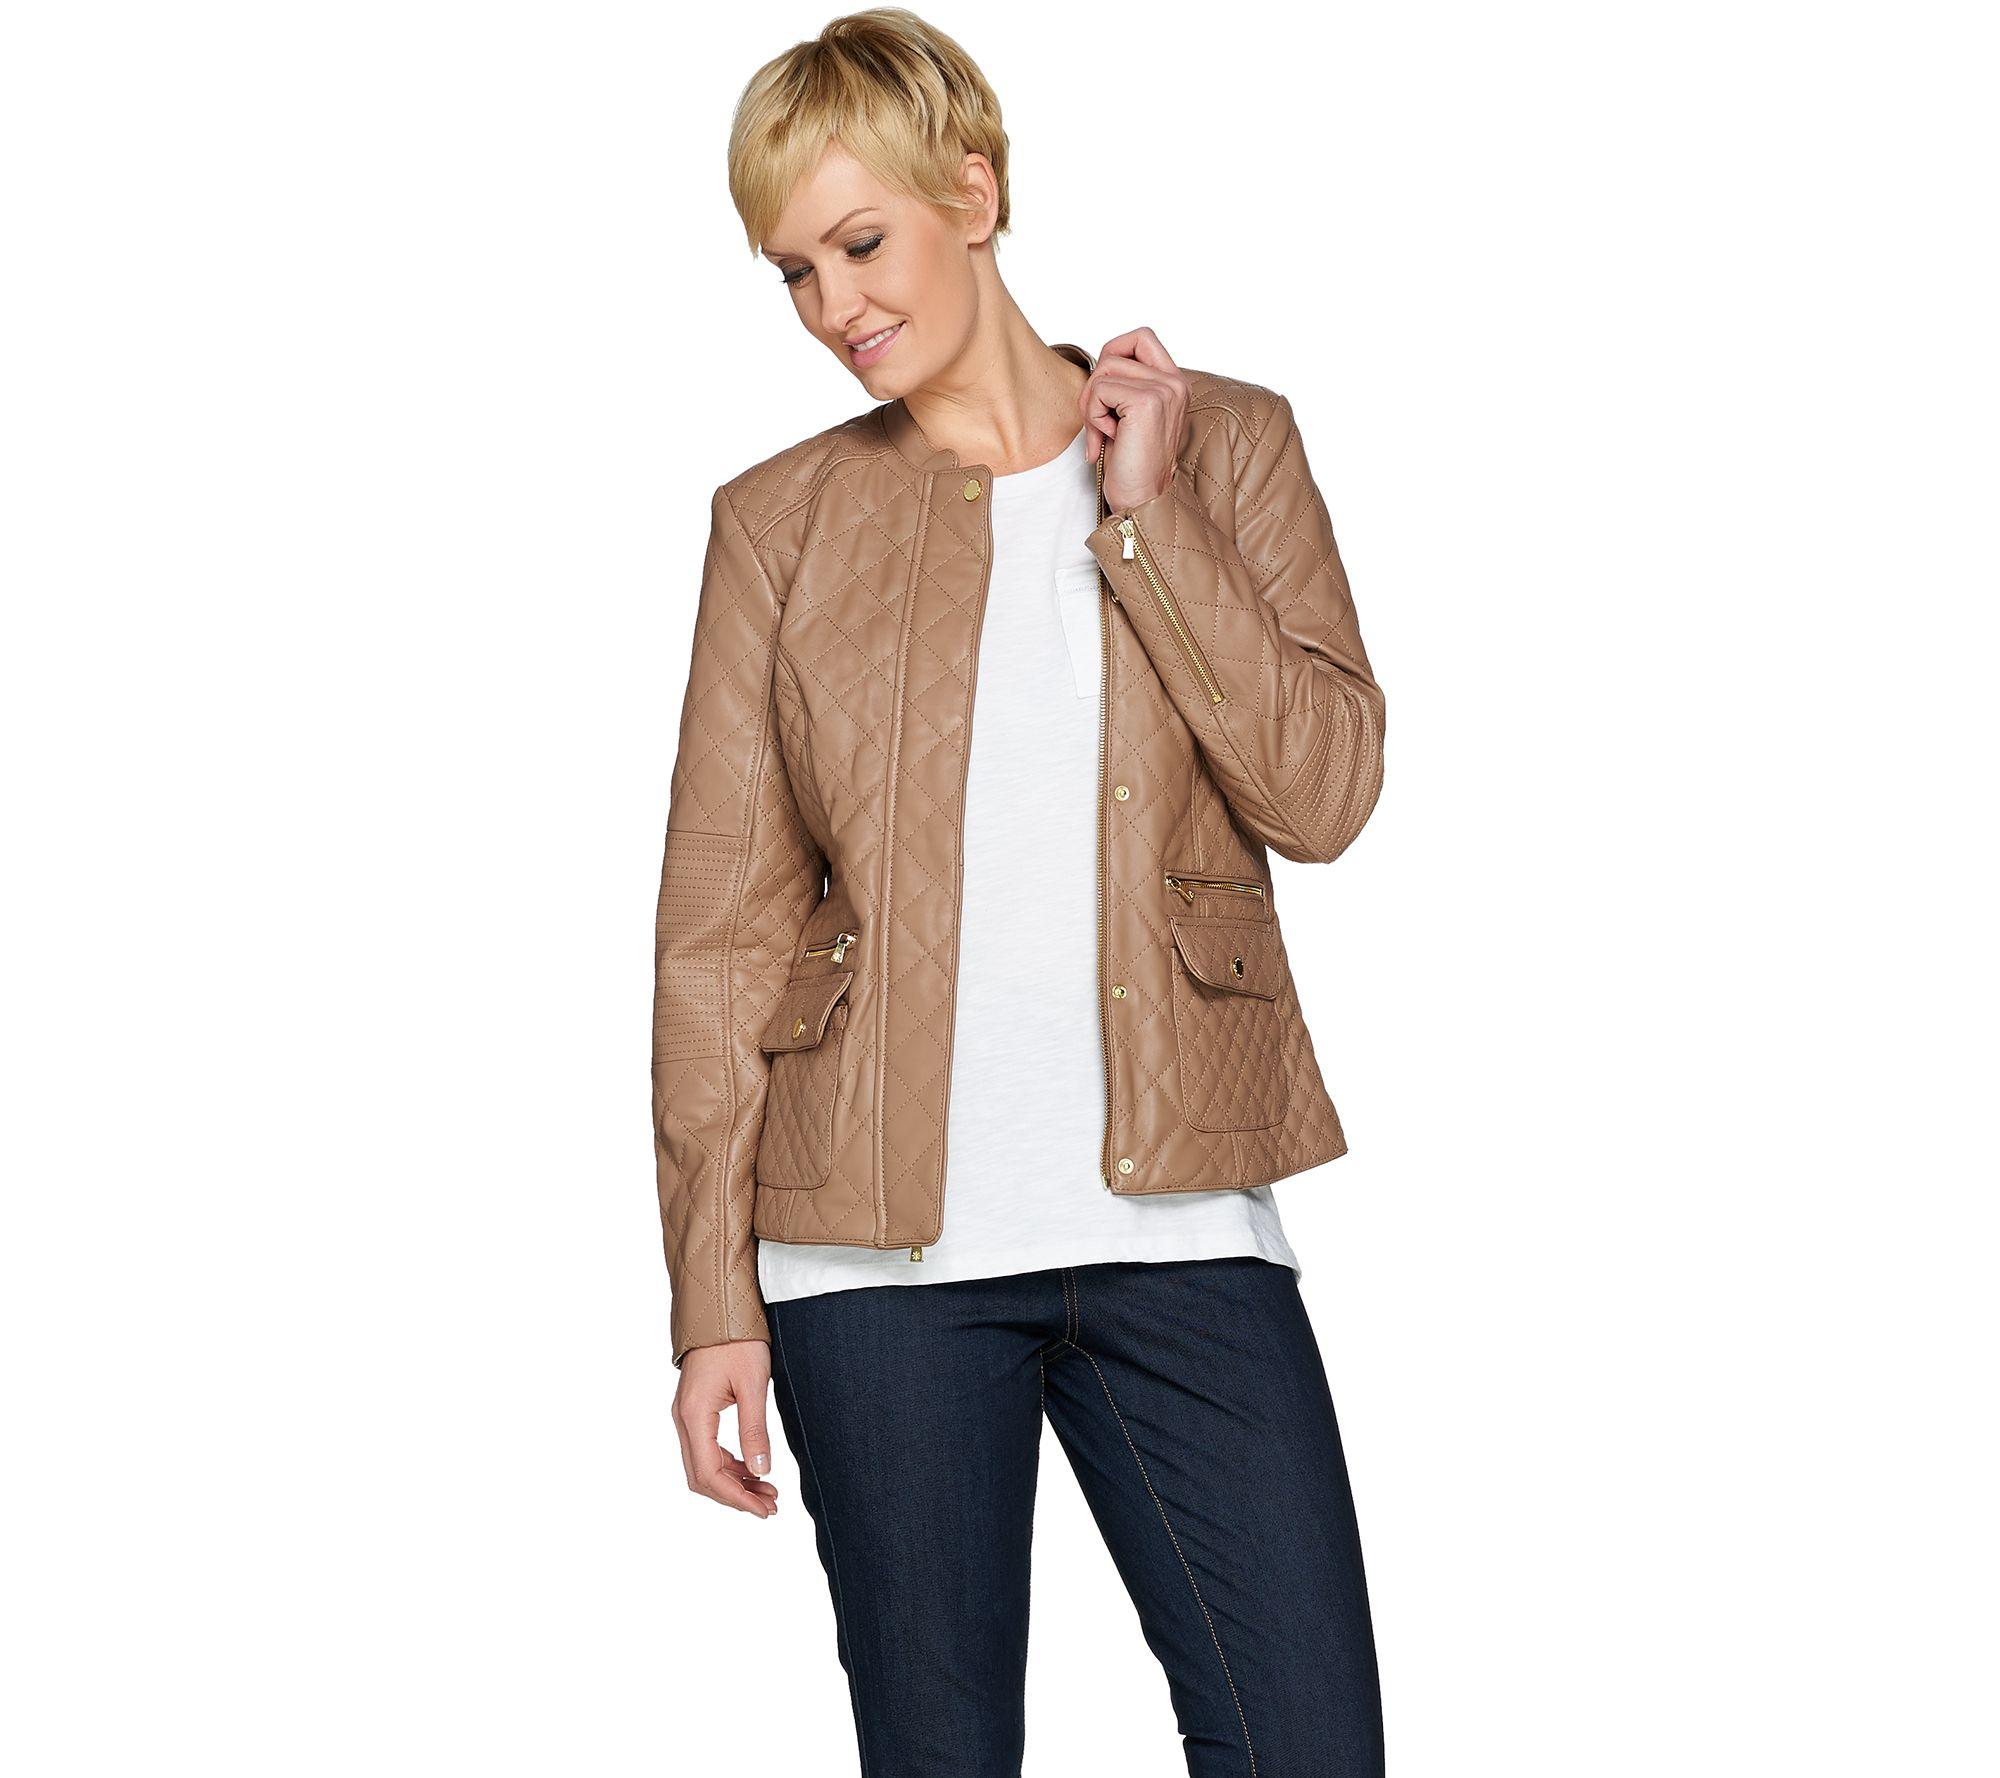 surf quilted m products barn mash mollusk shop jackets womens barns green jacket